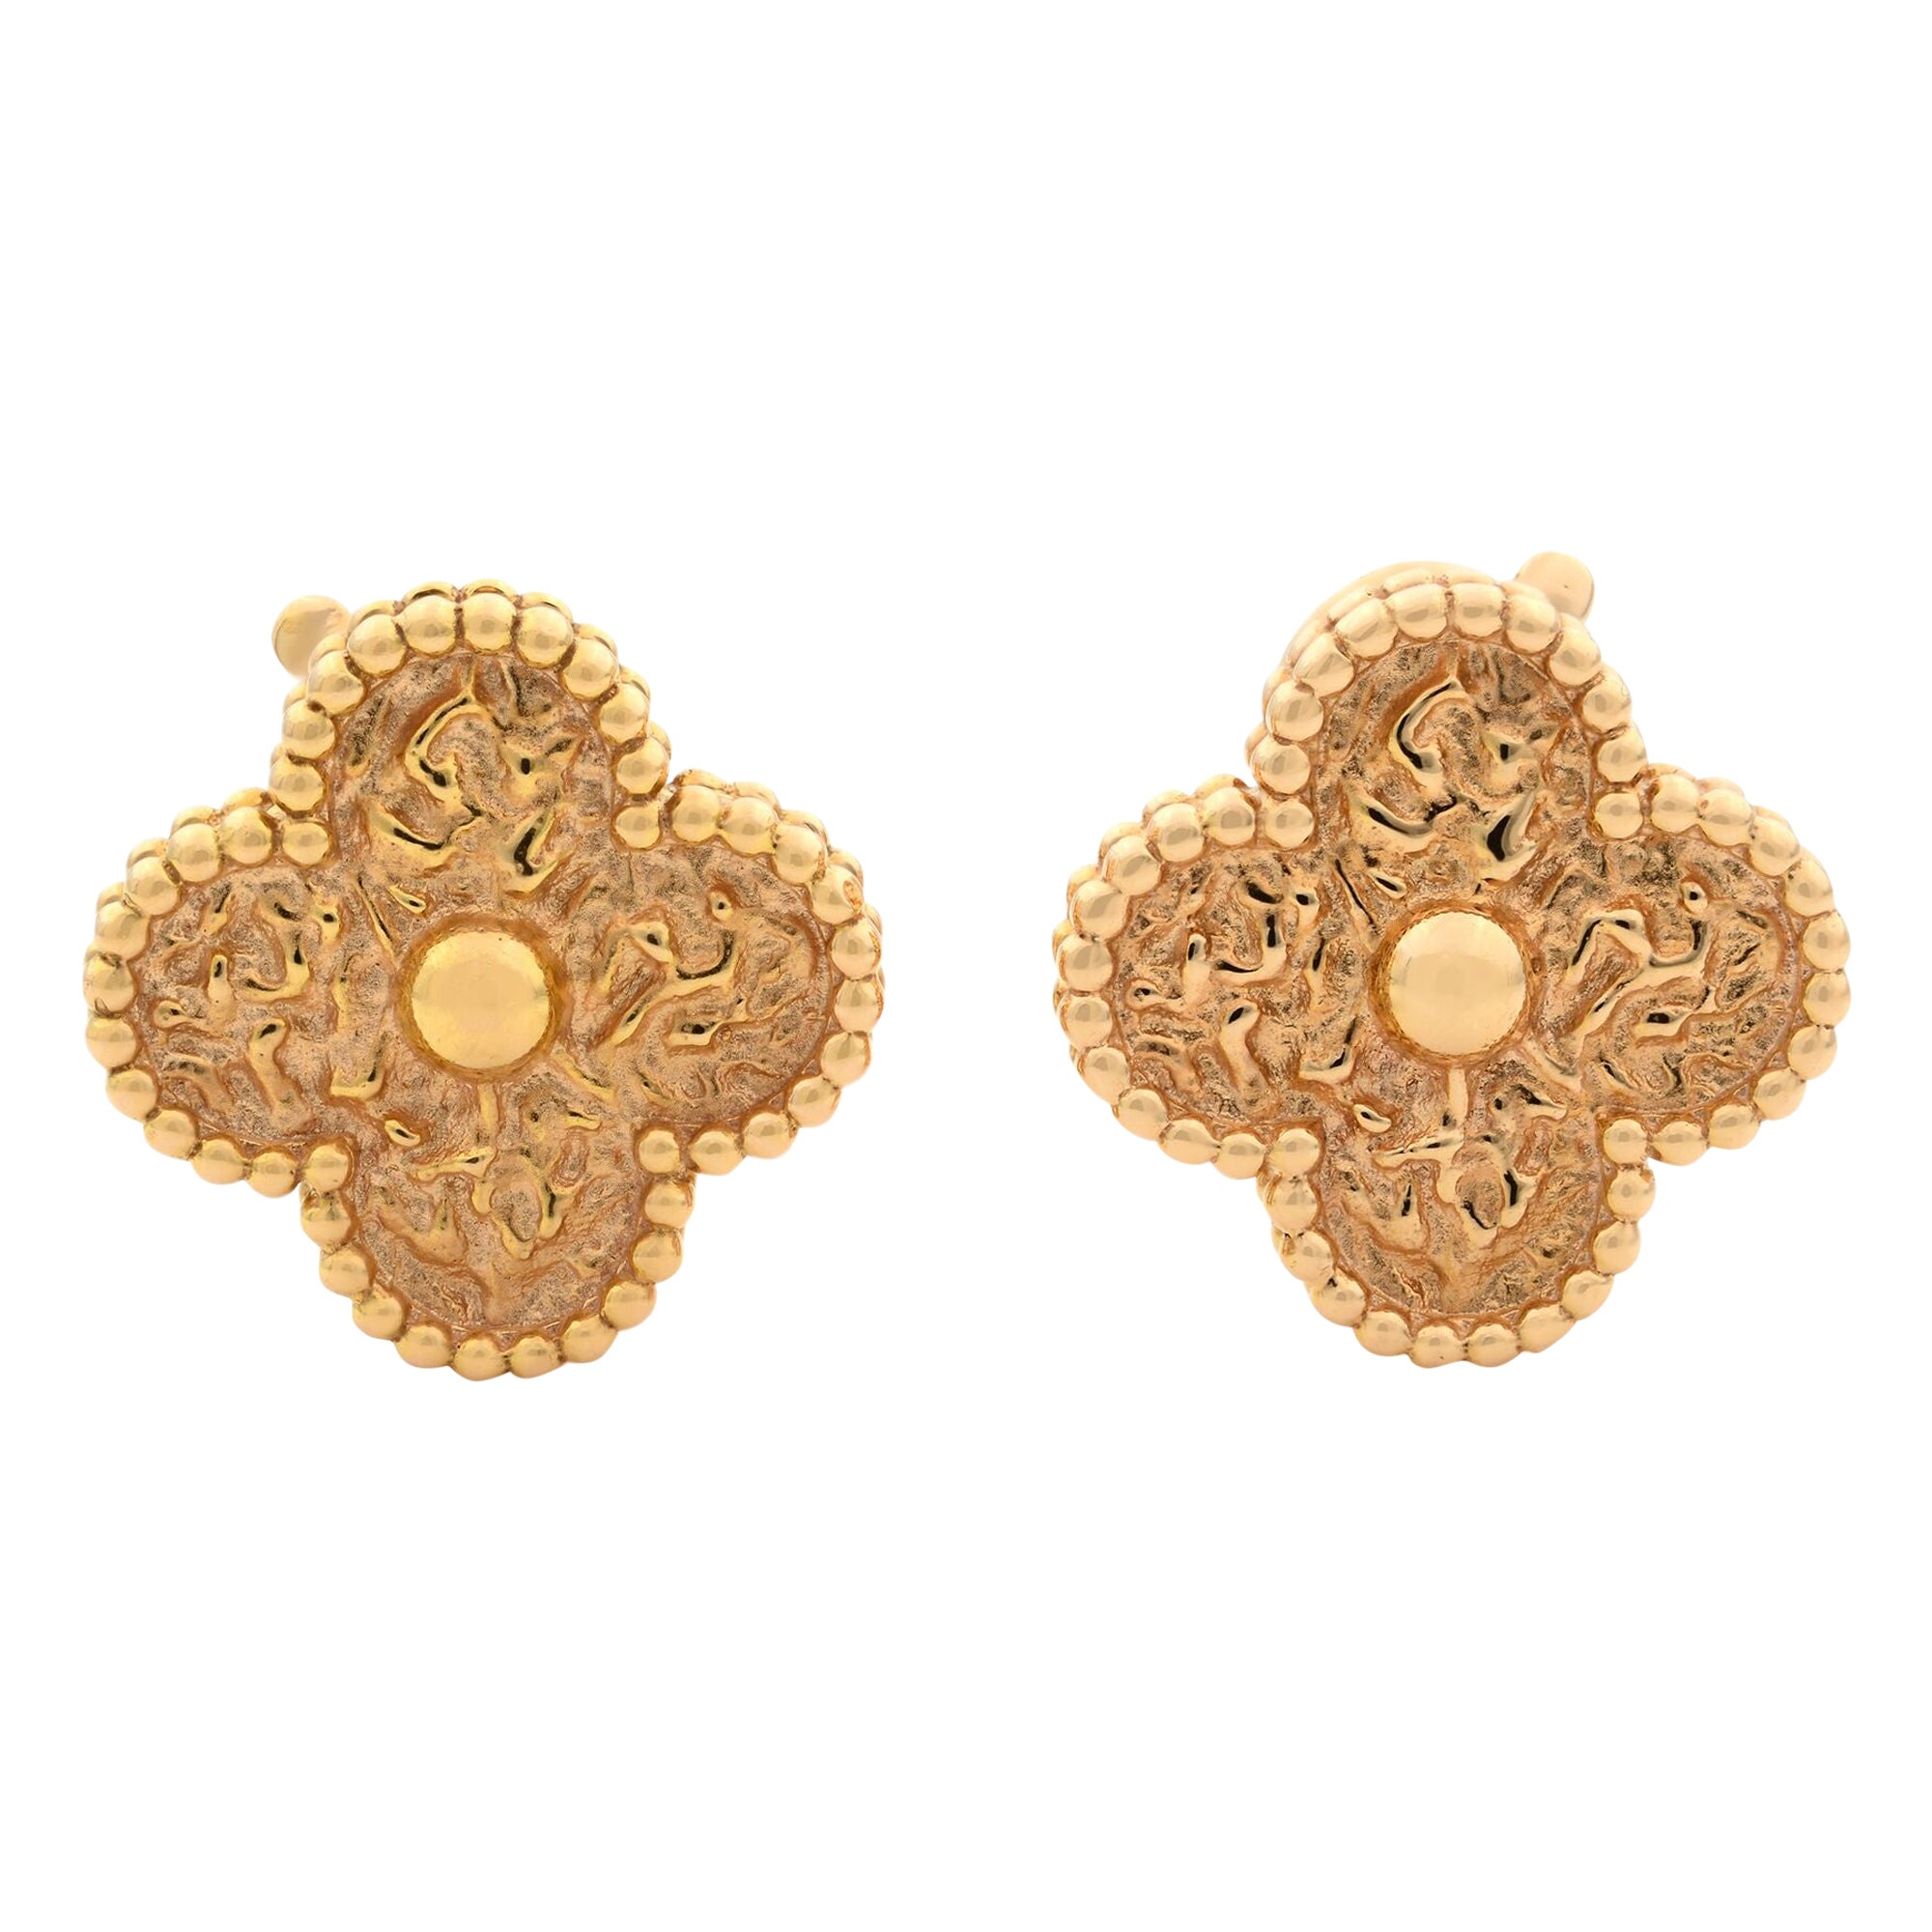 Van Cleef & Arpels 18 Karat Rose Gold Magic Alhambra Clip Earrings